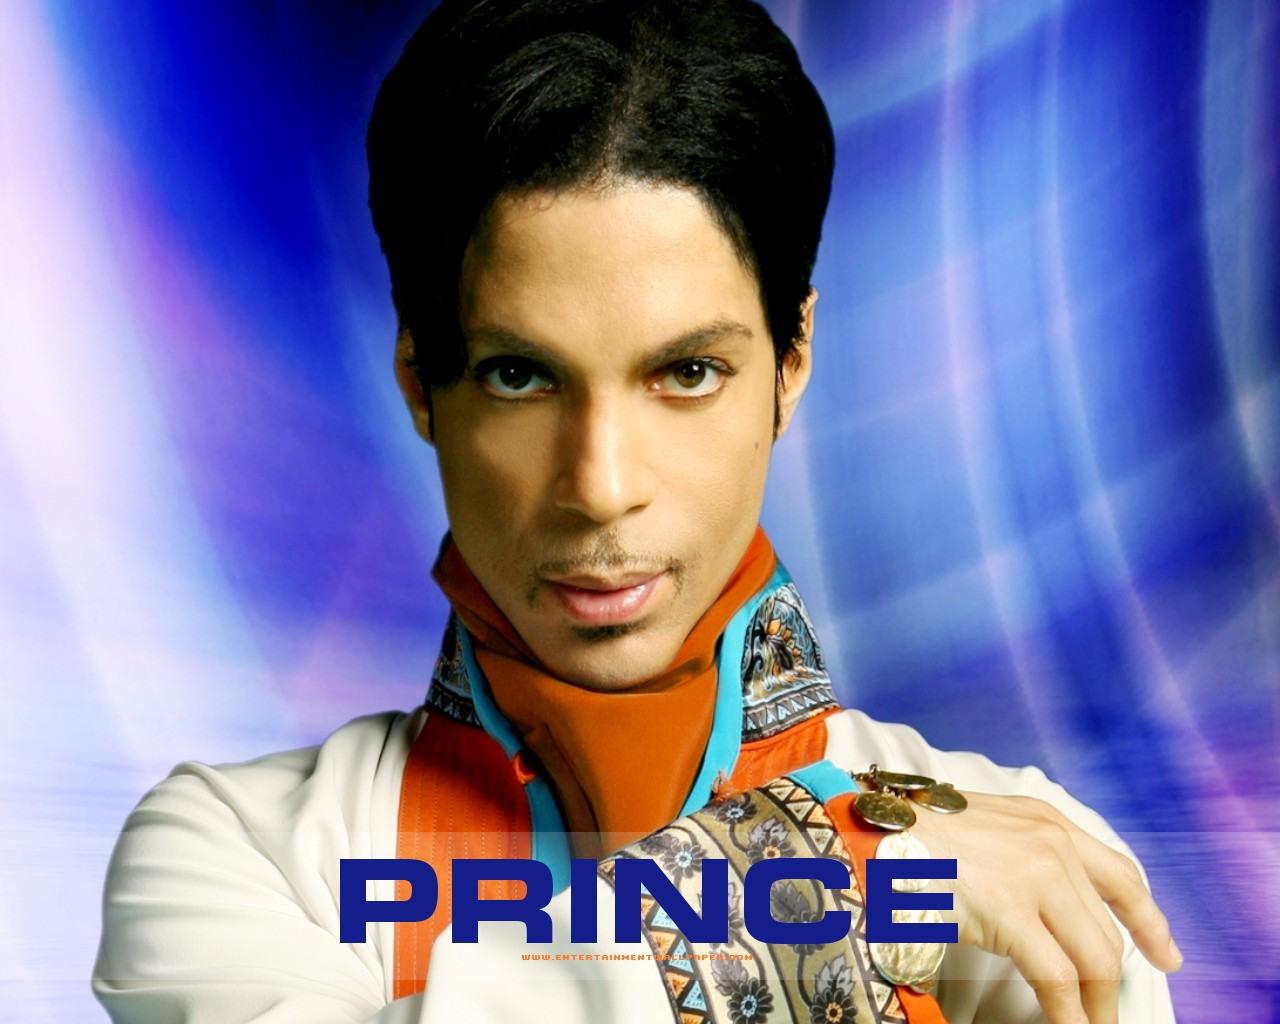 Prince background wallpaper wallpapersafari - Prince wallpaper ...